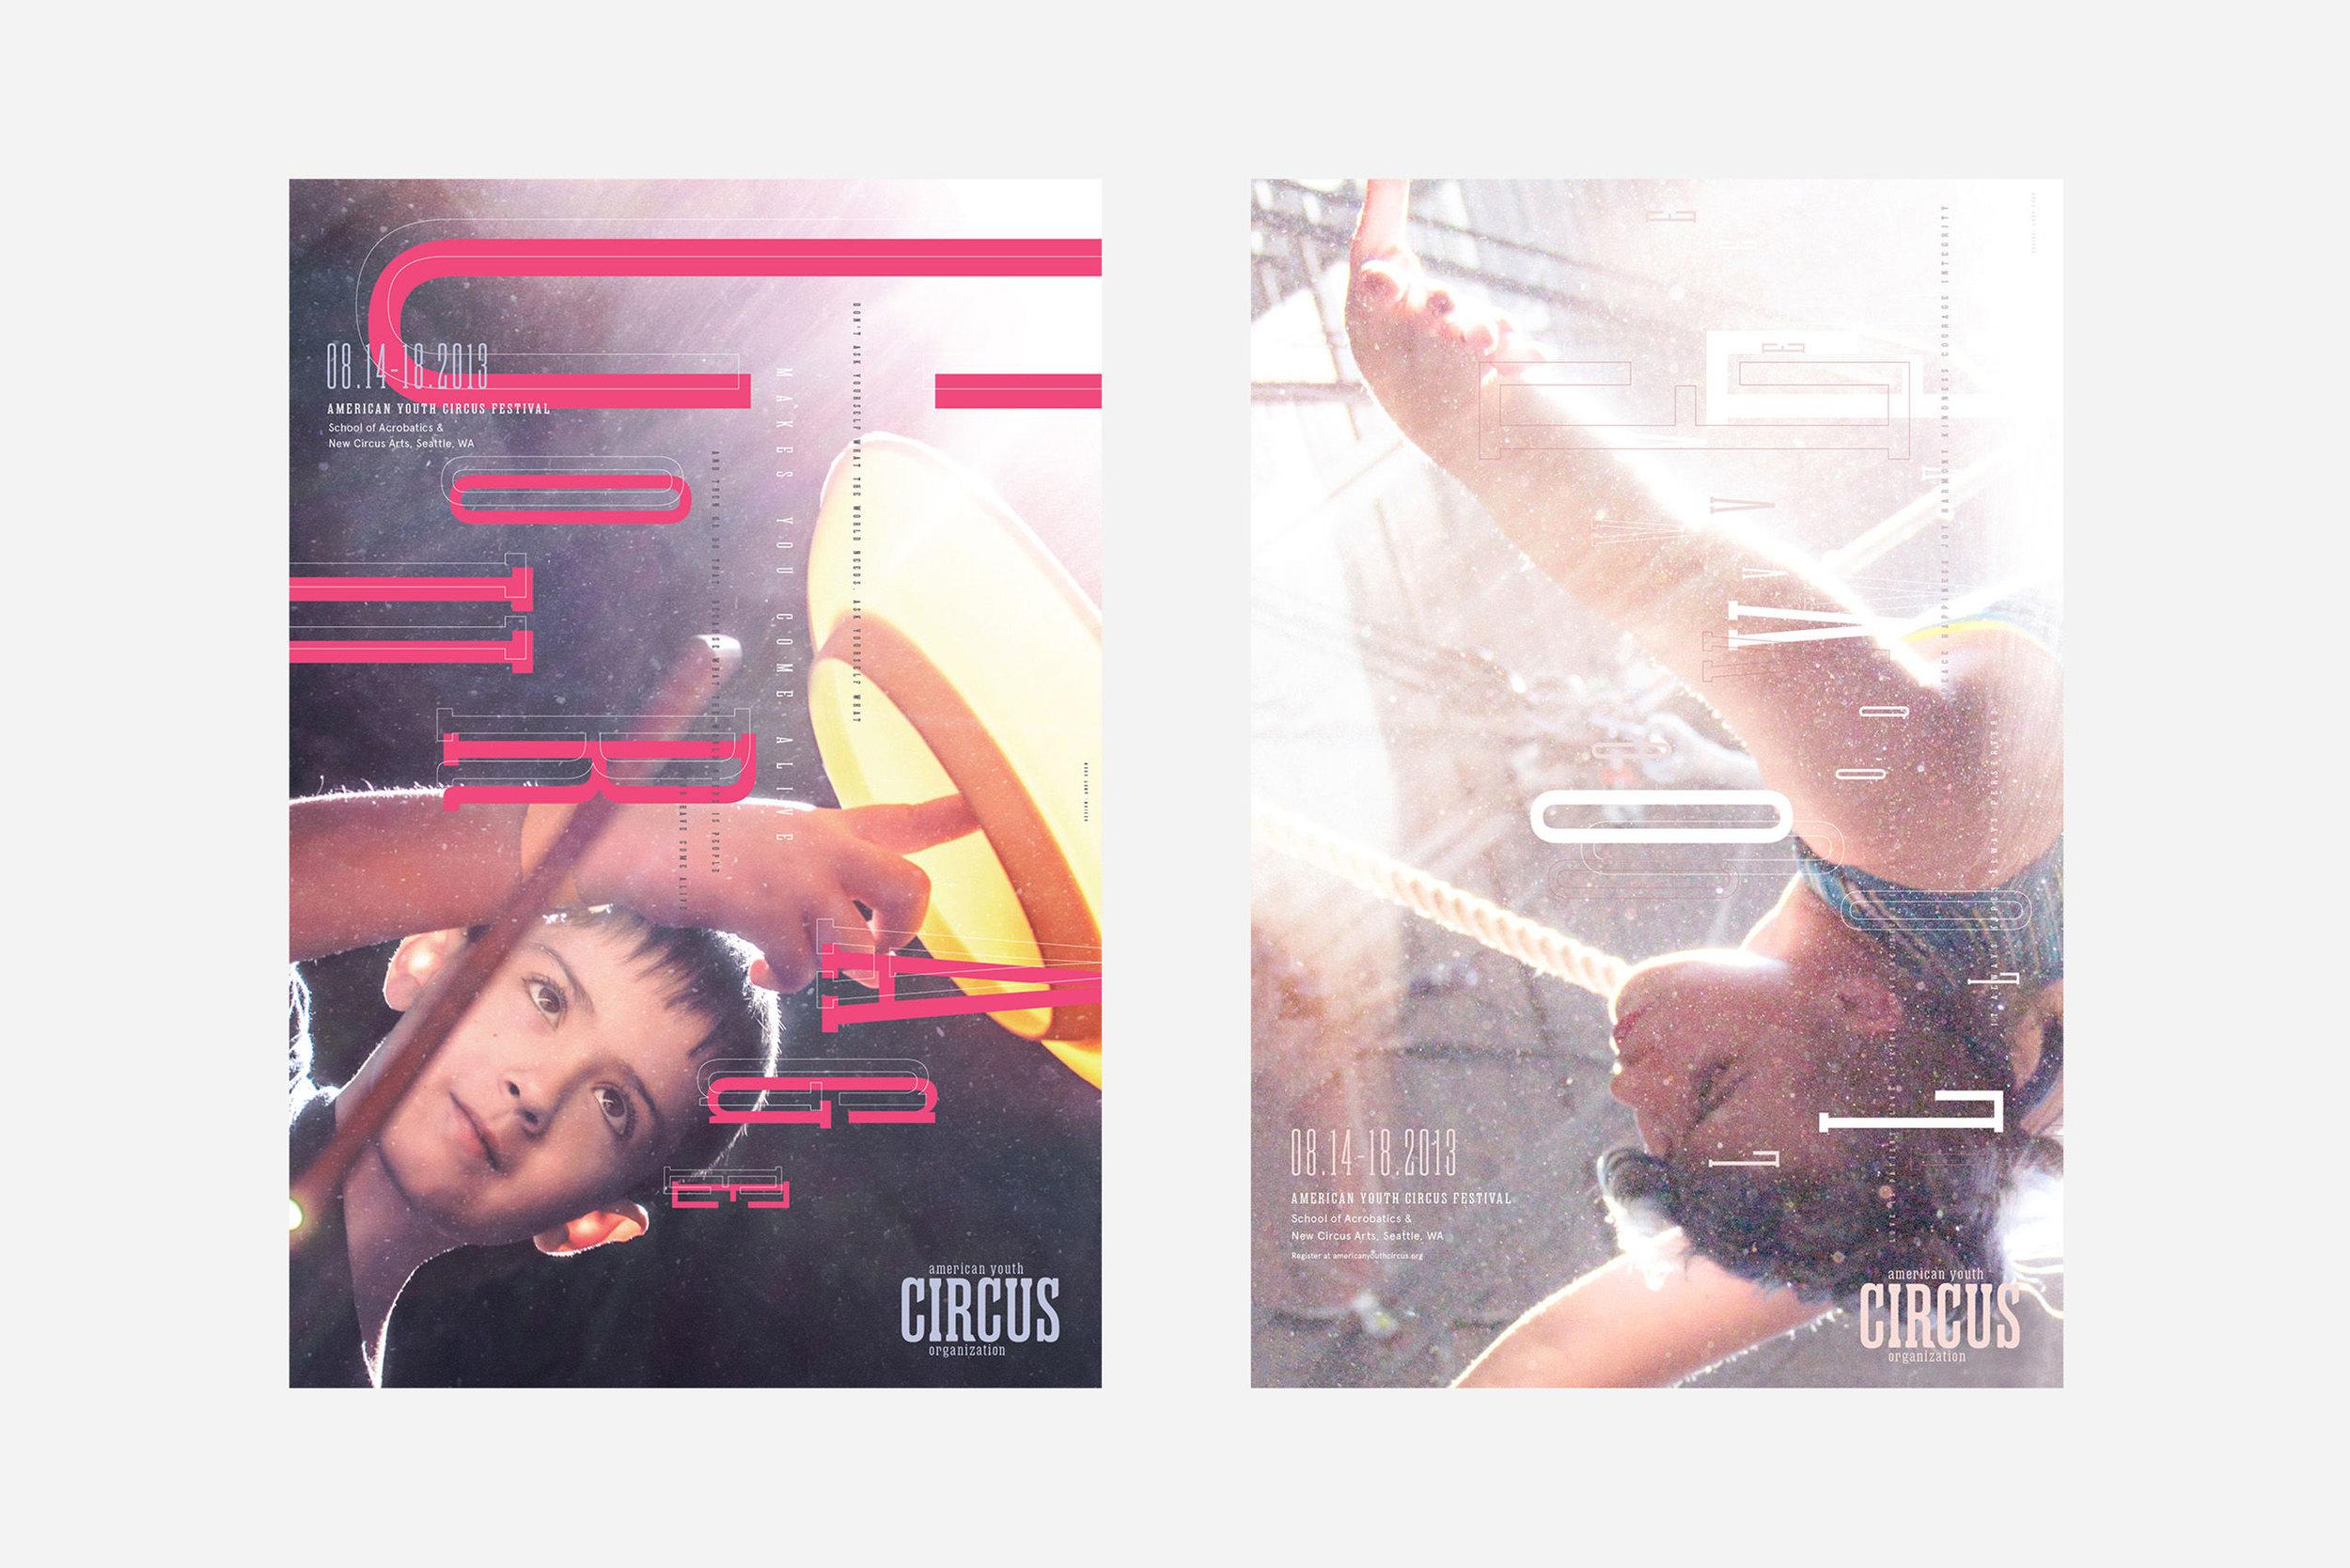 posters1-1345x898@2x.jpg